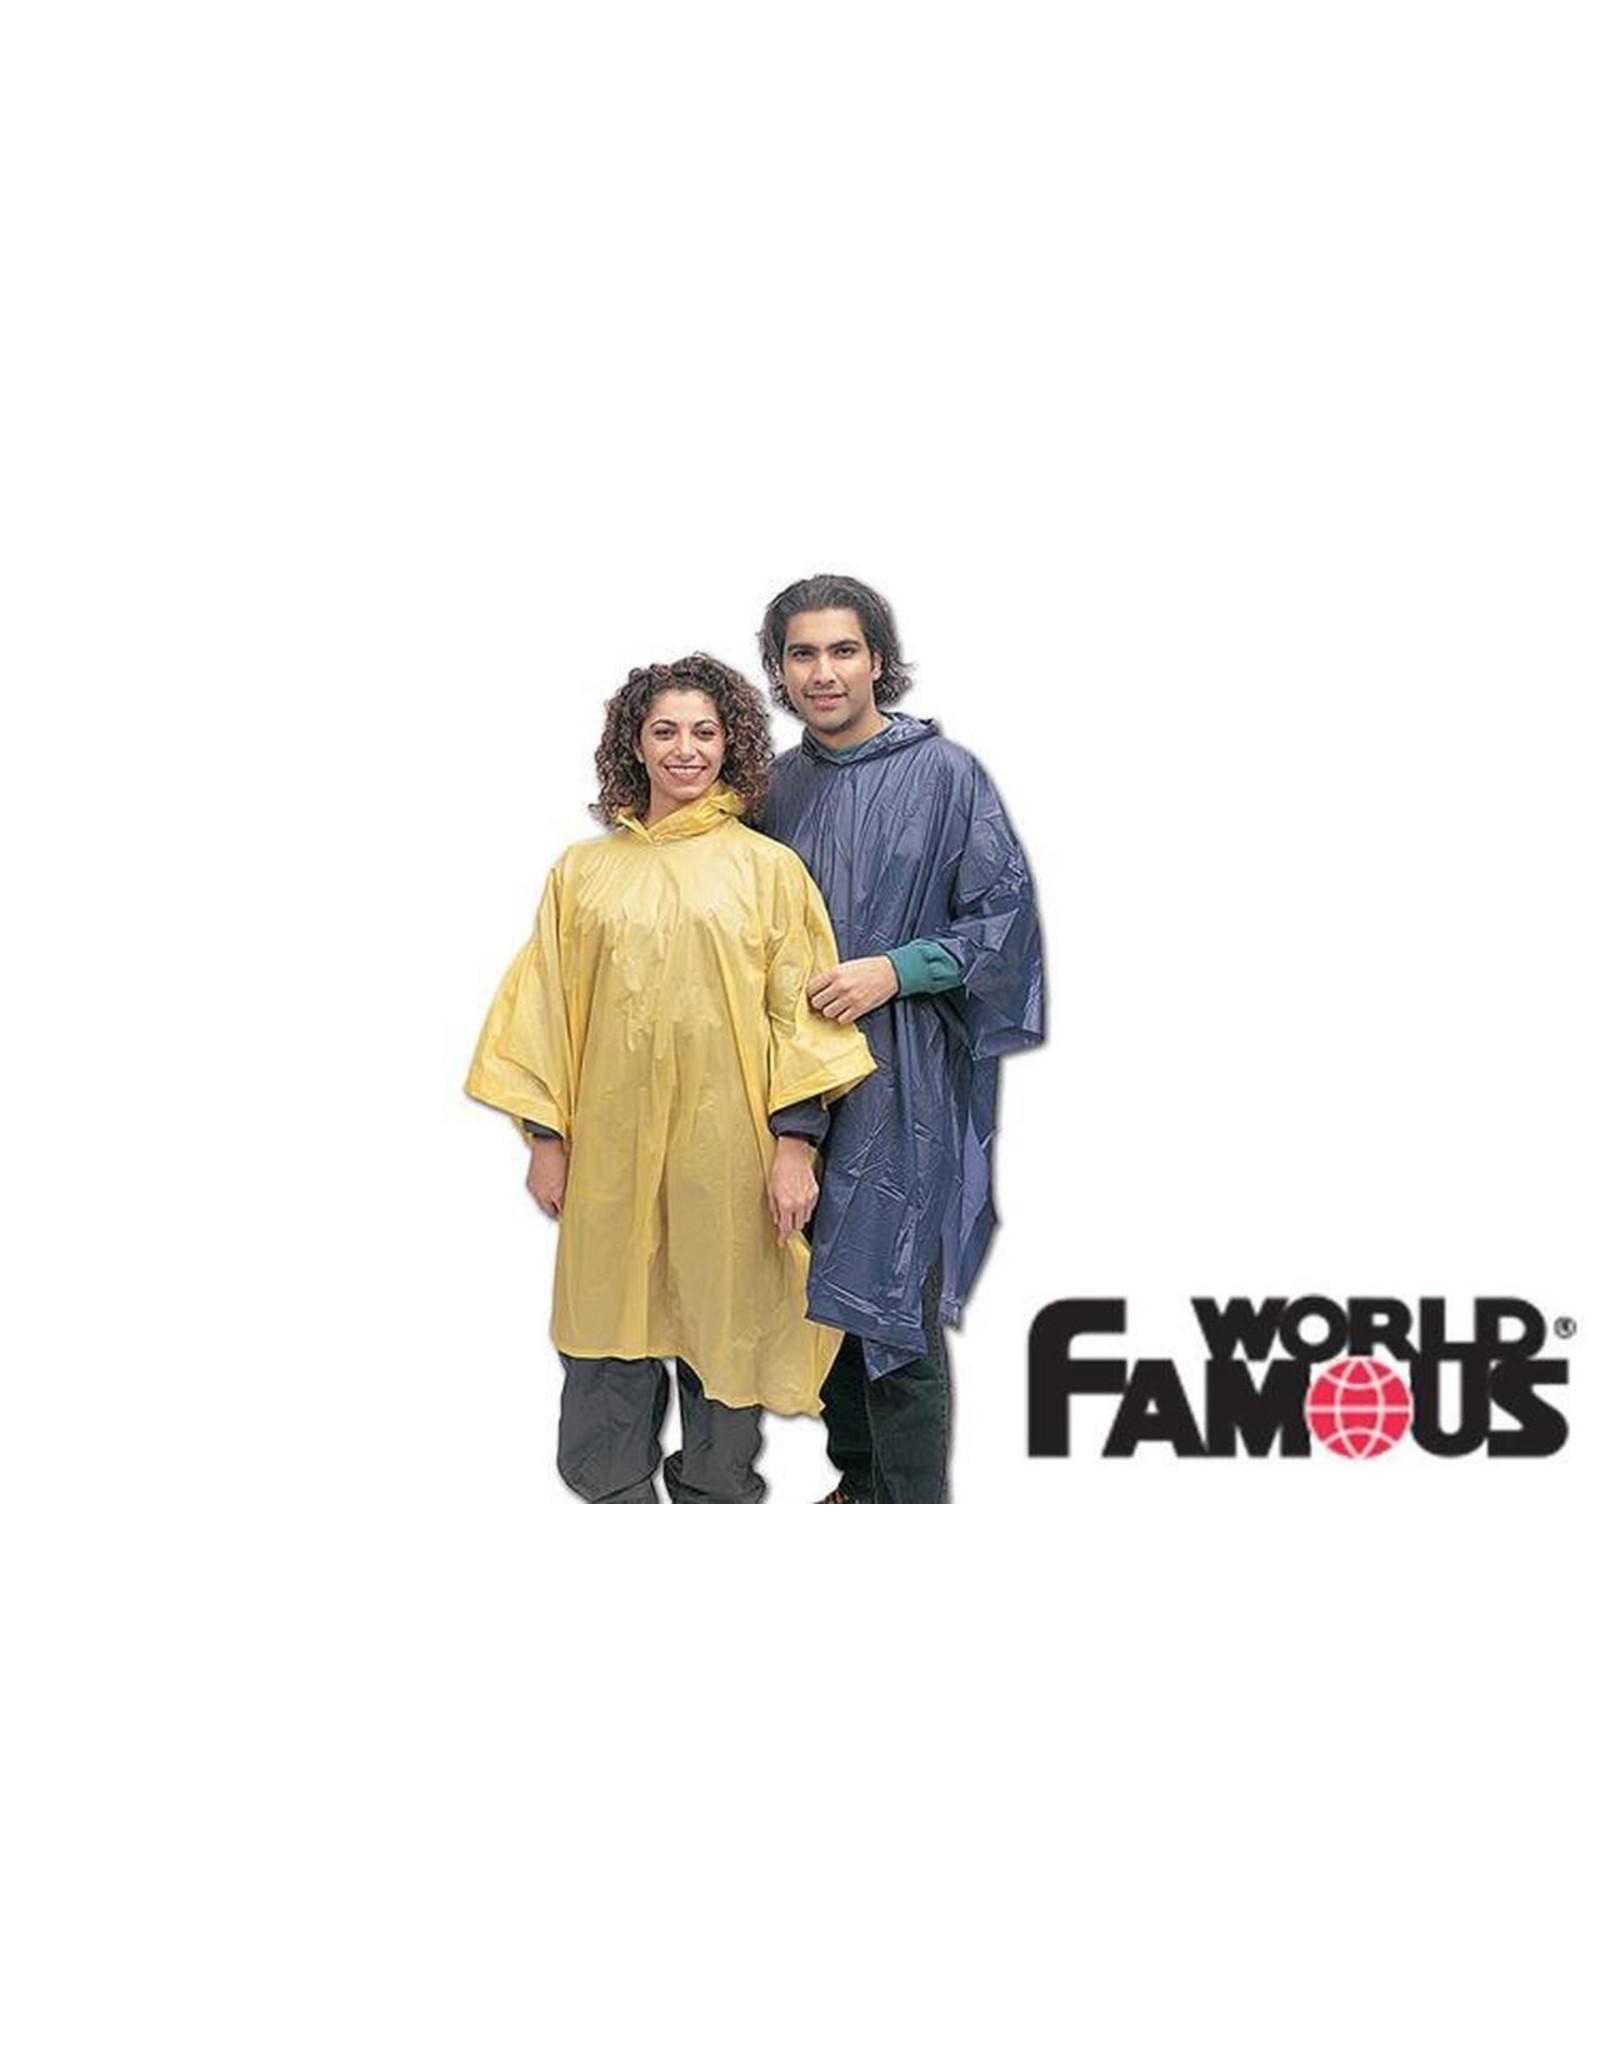 WORLD FAMOUS SALES VINYL PONCHO